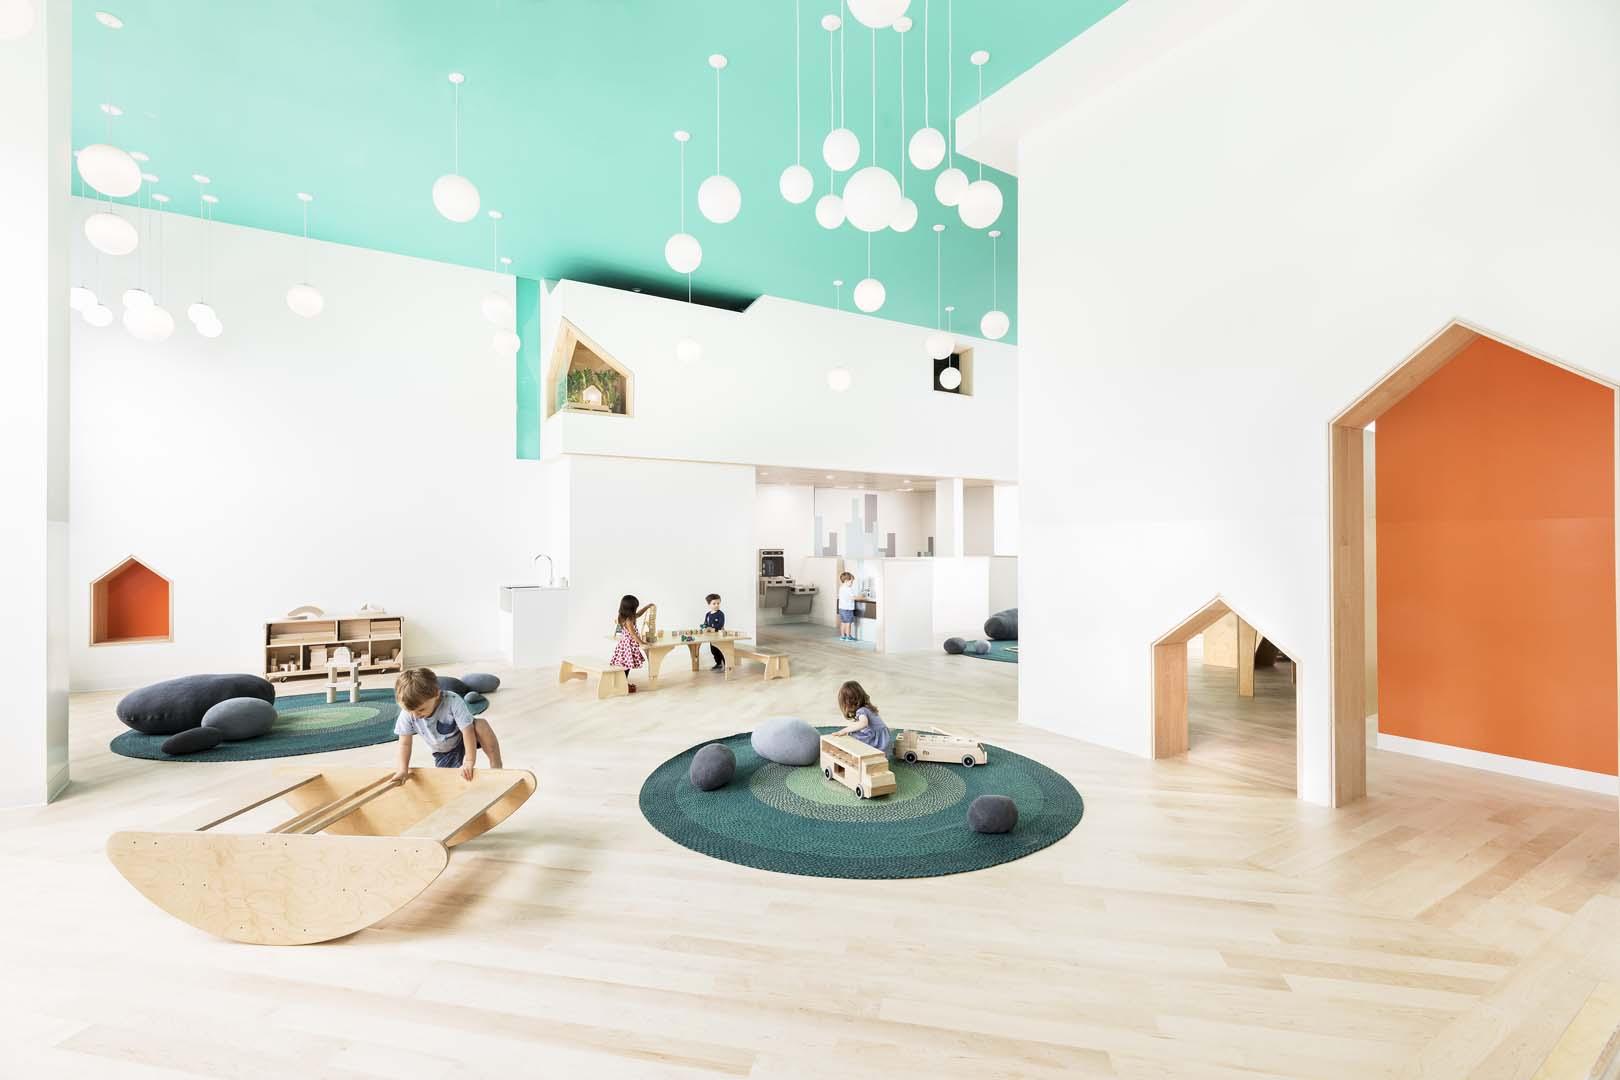 Mi Casita Preschool and Cultural Center